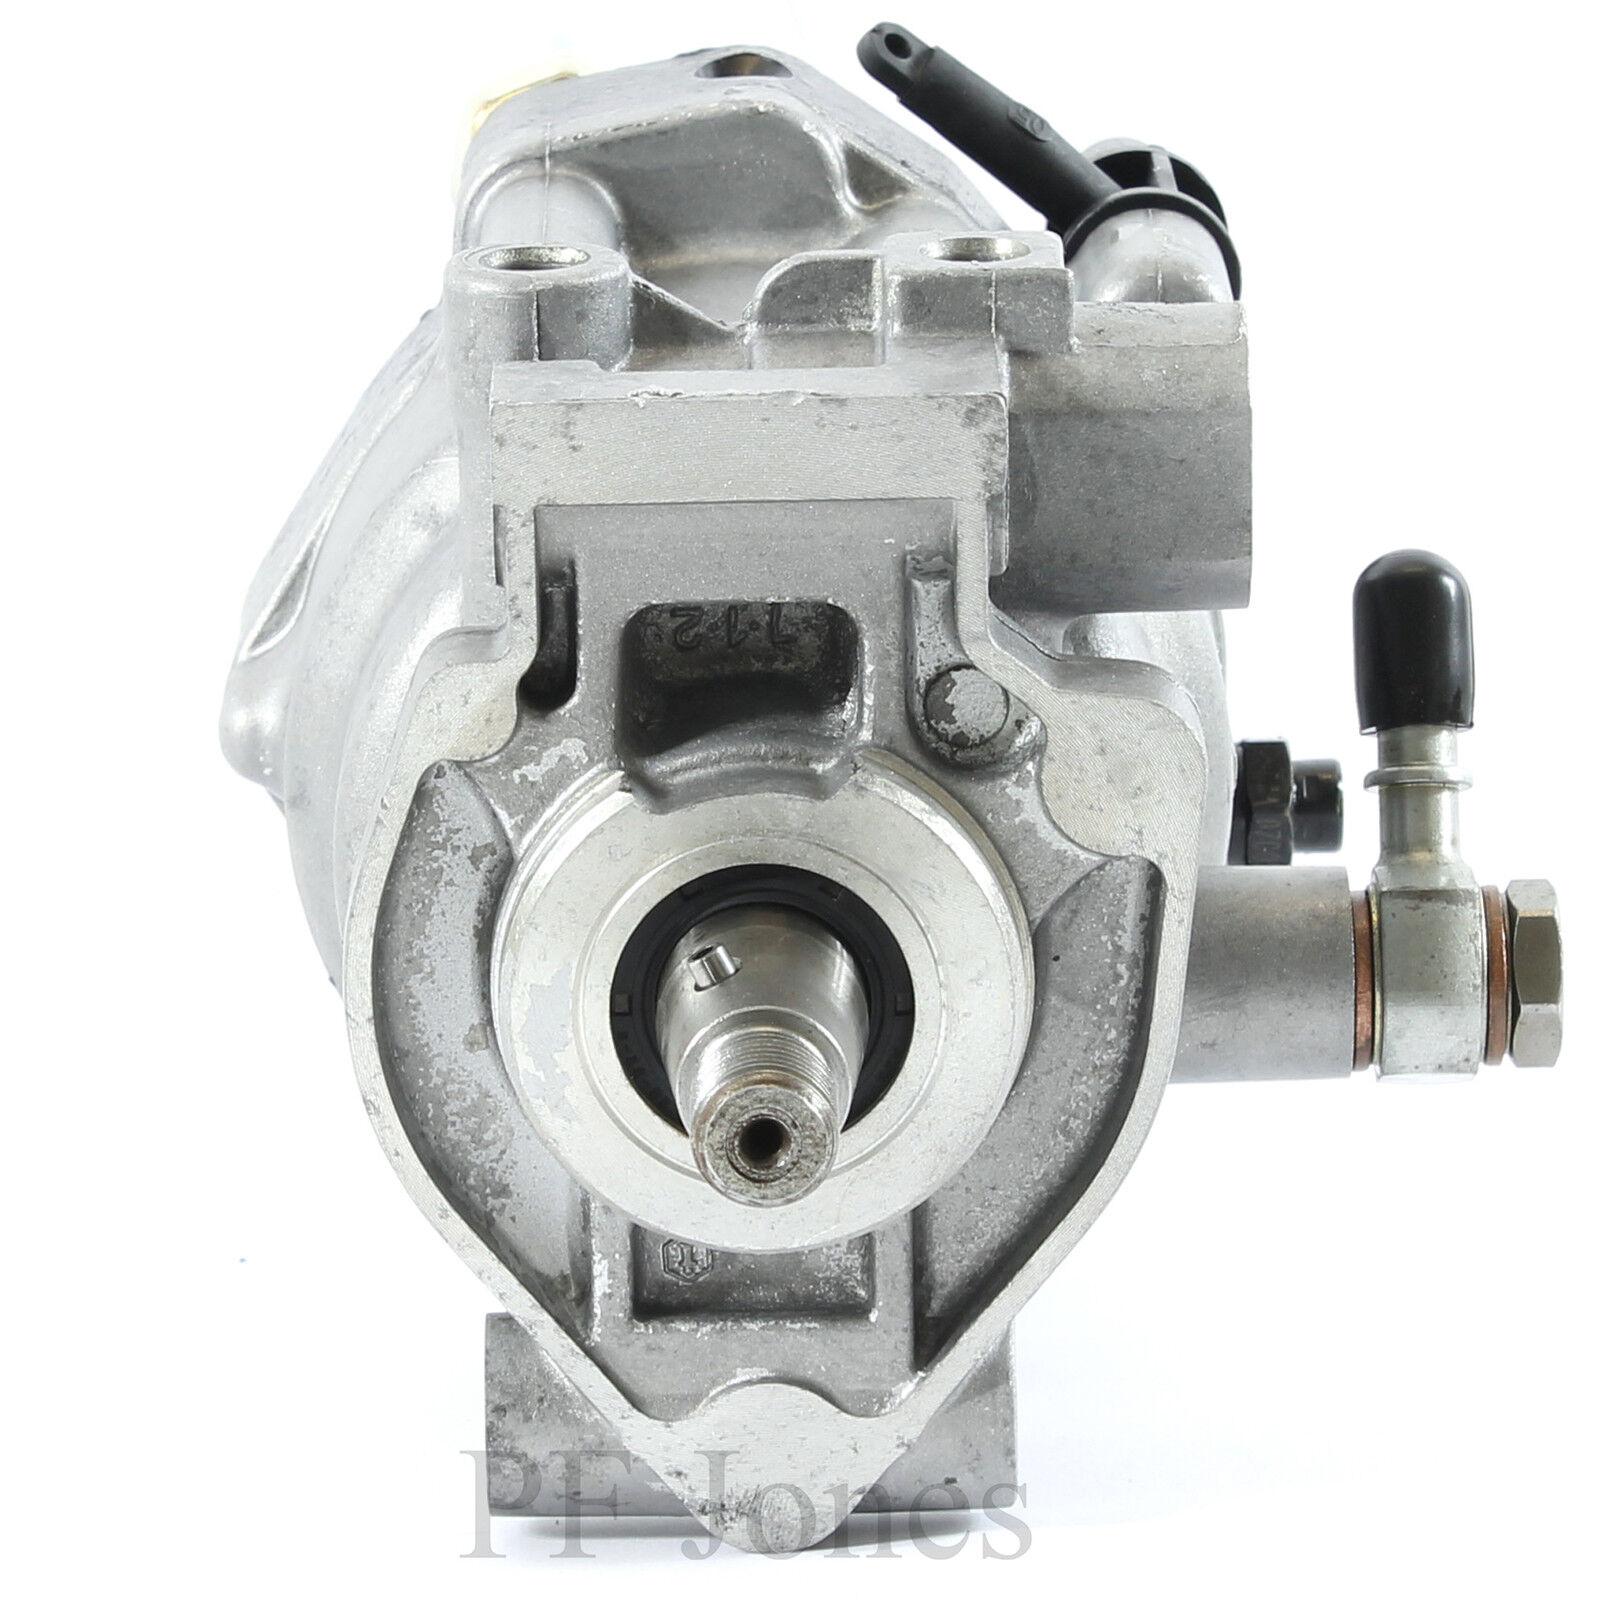 New delphi diesel fuel pump 28326392